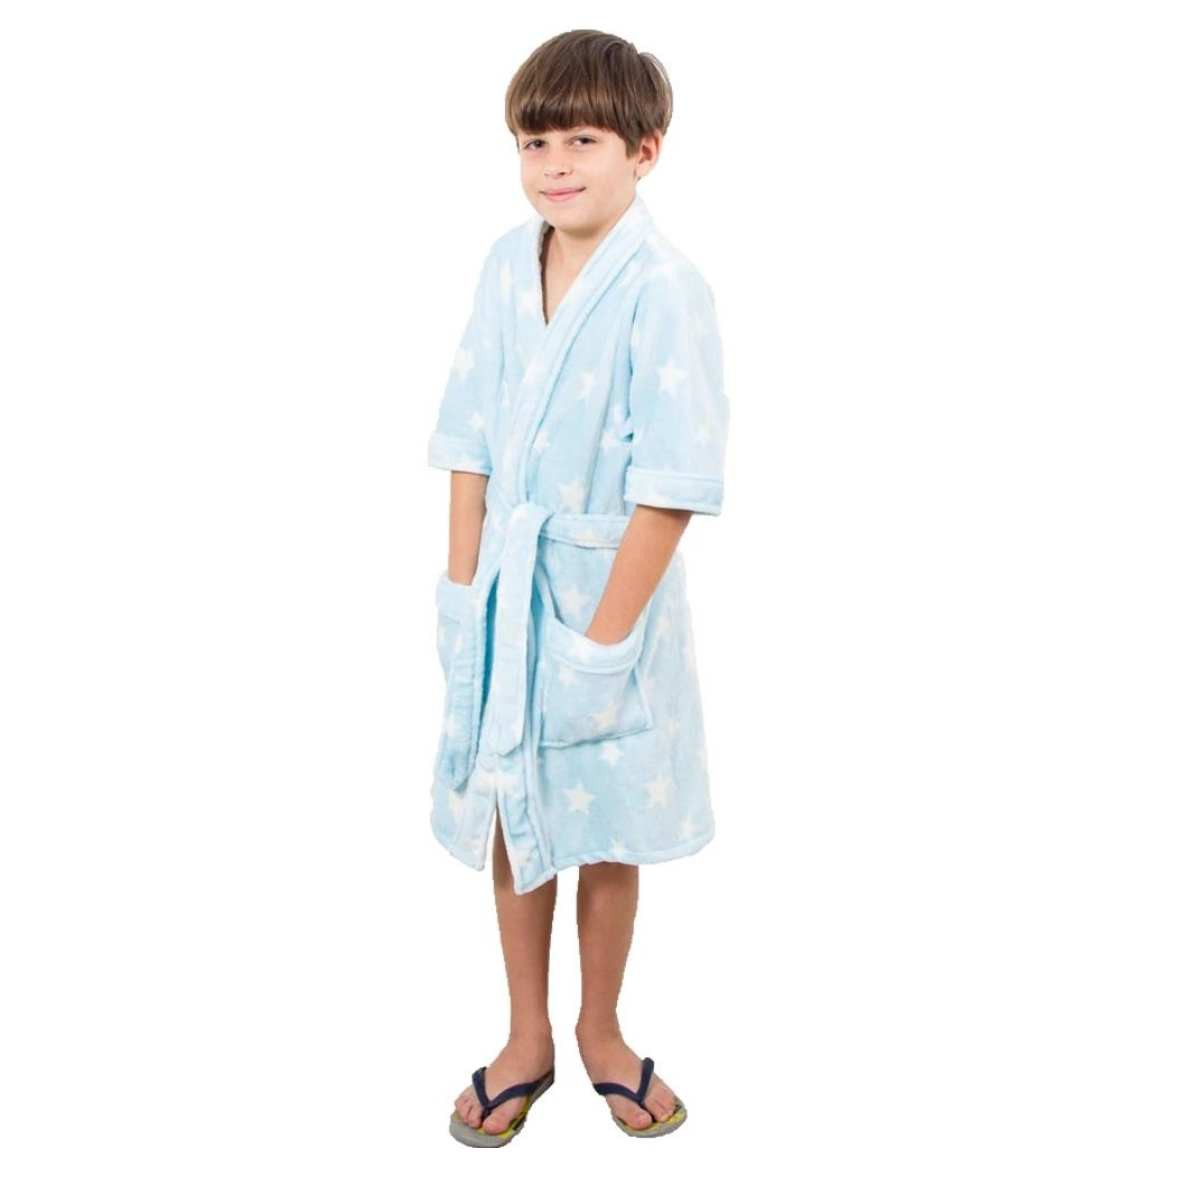 Roupão Infantil Zucchi M - Azul